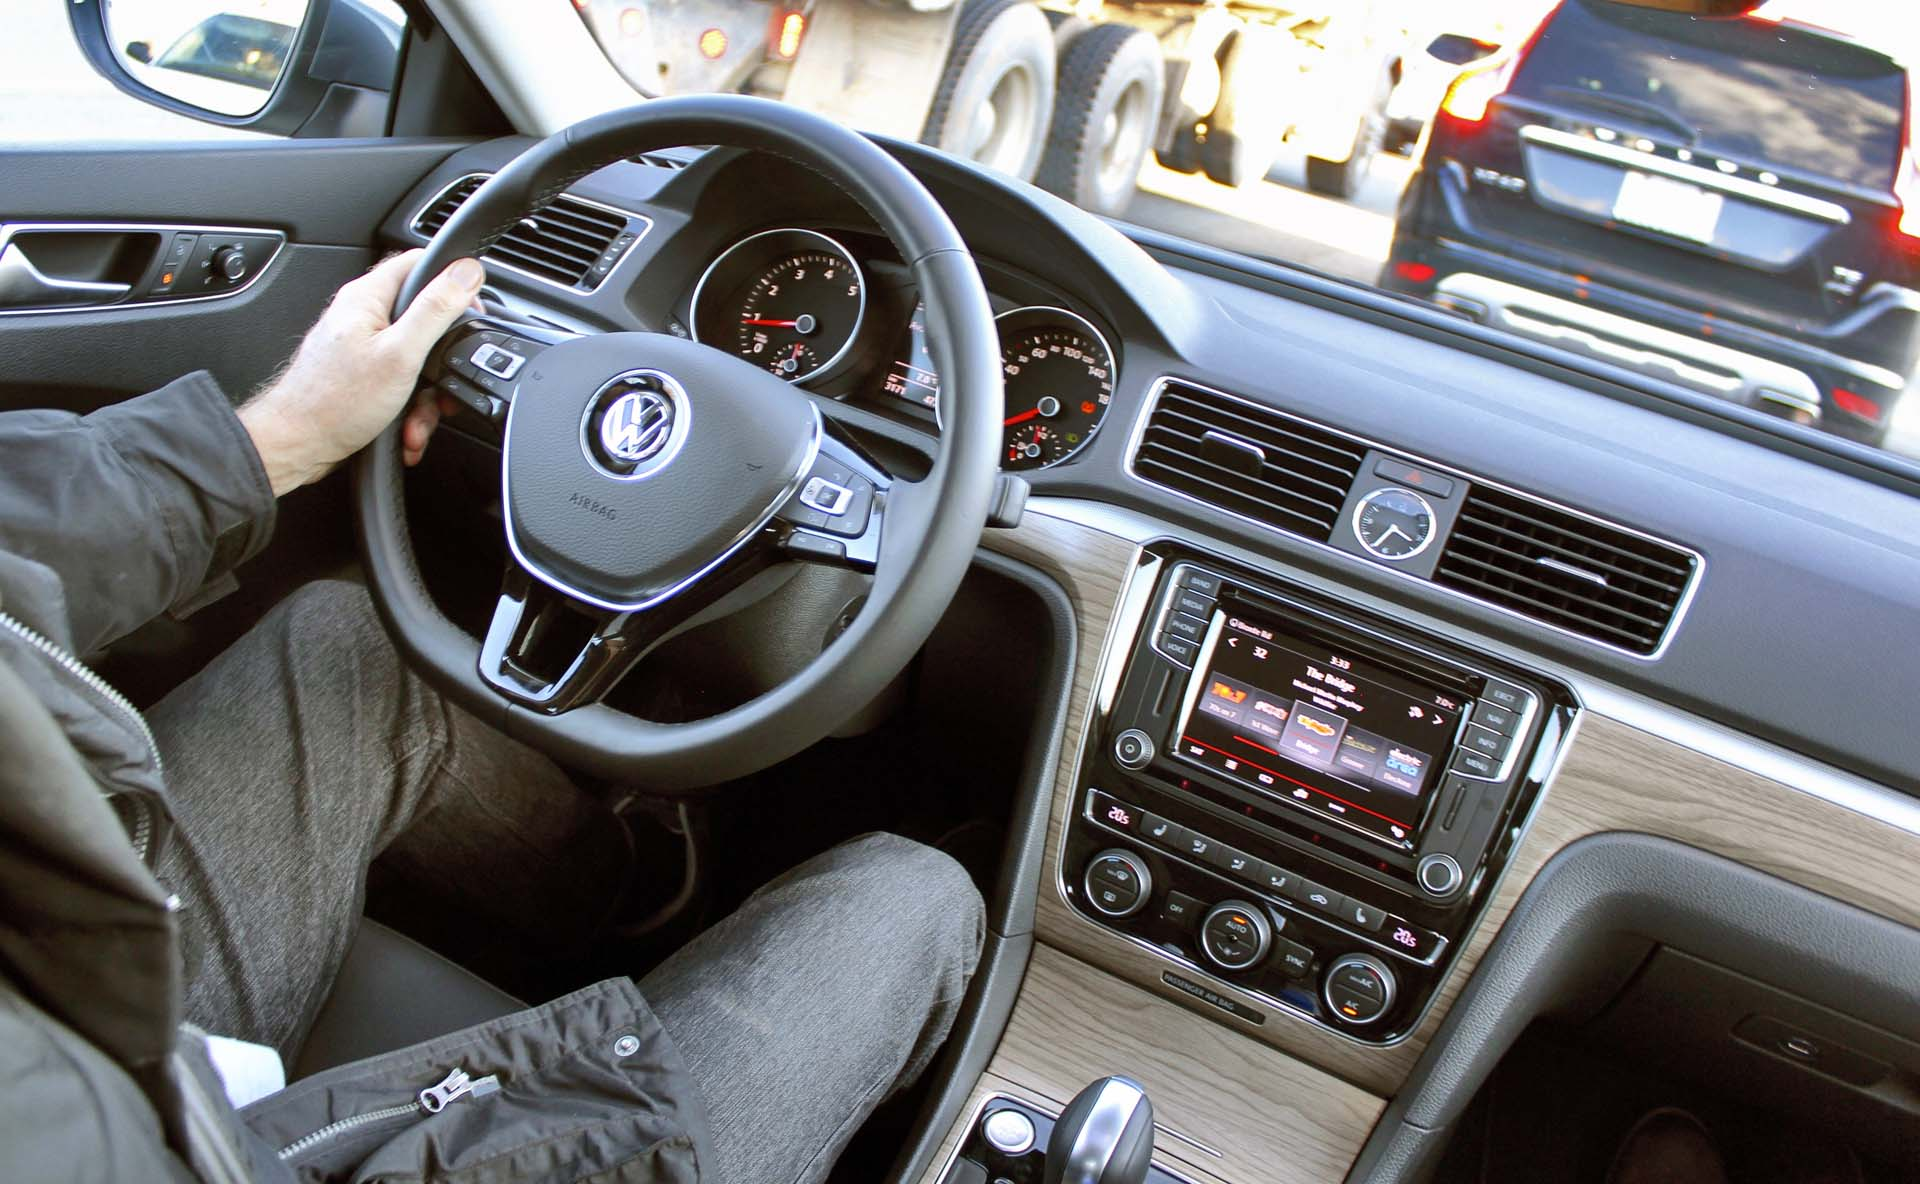 Used Nissan Pathfinder Reviews 2016 Volkswagen Passat Highline - Autos.ca